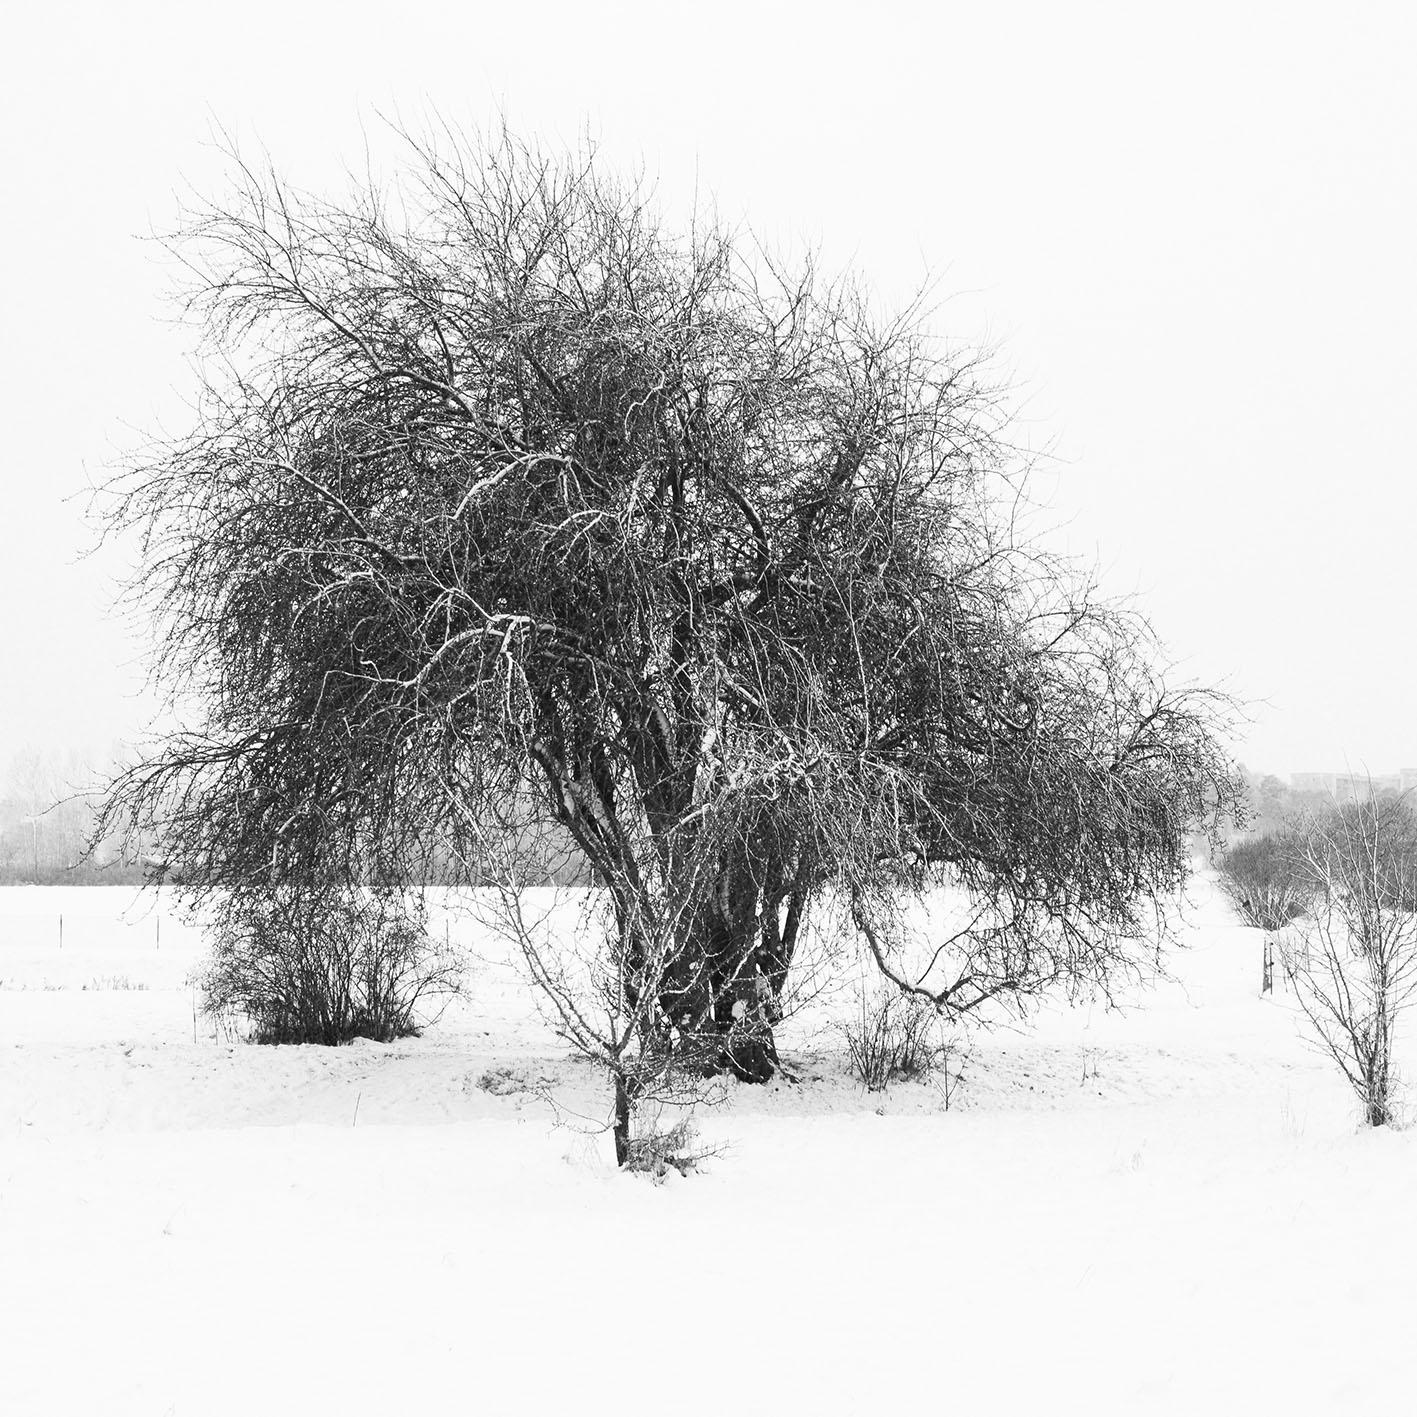 2013-12-11 Portfolio-14.jpg